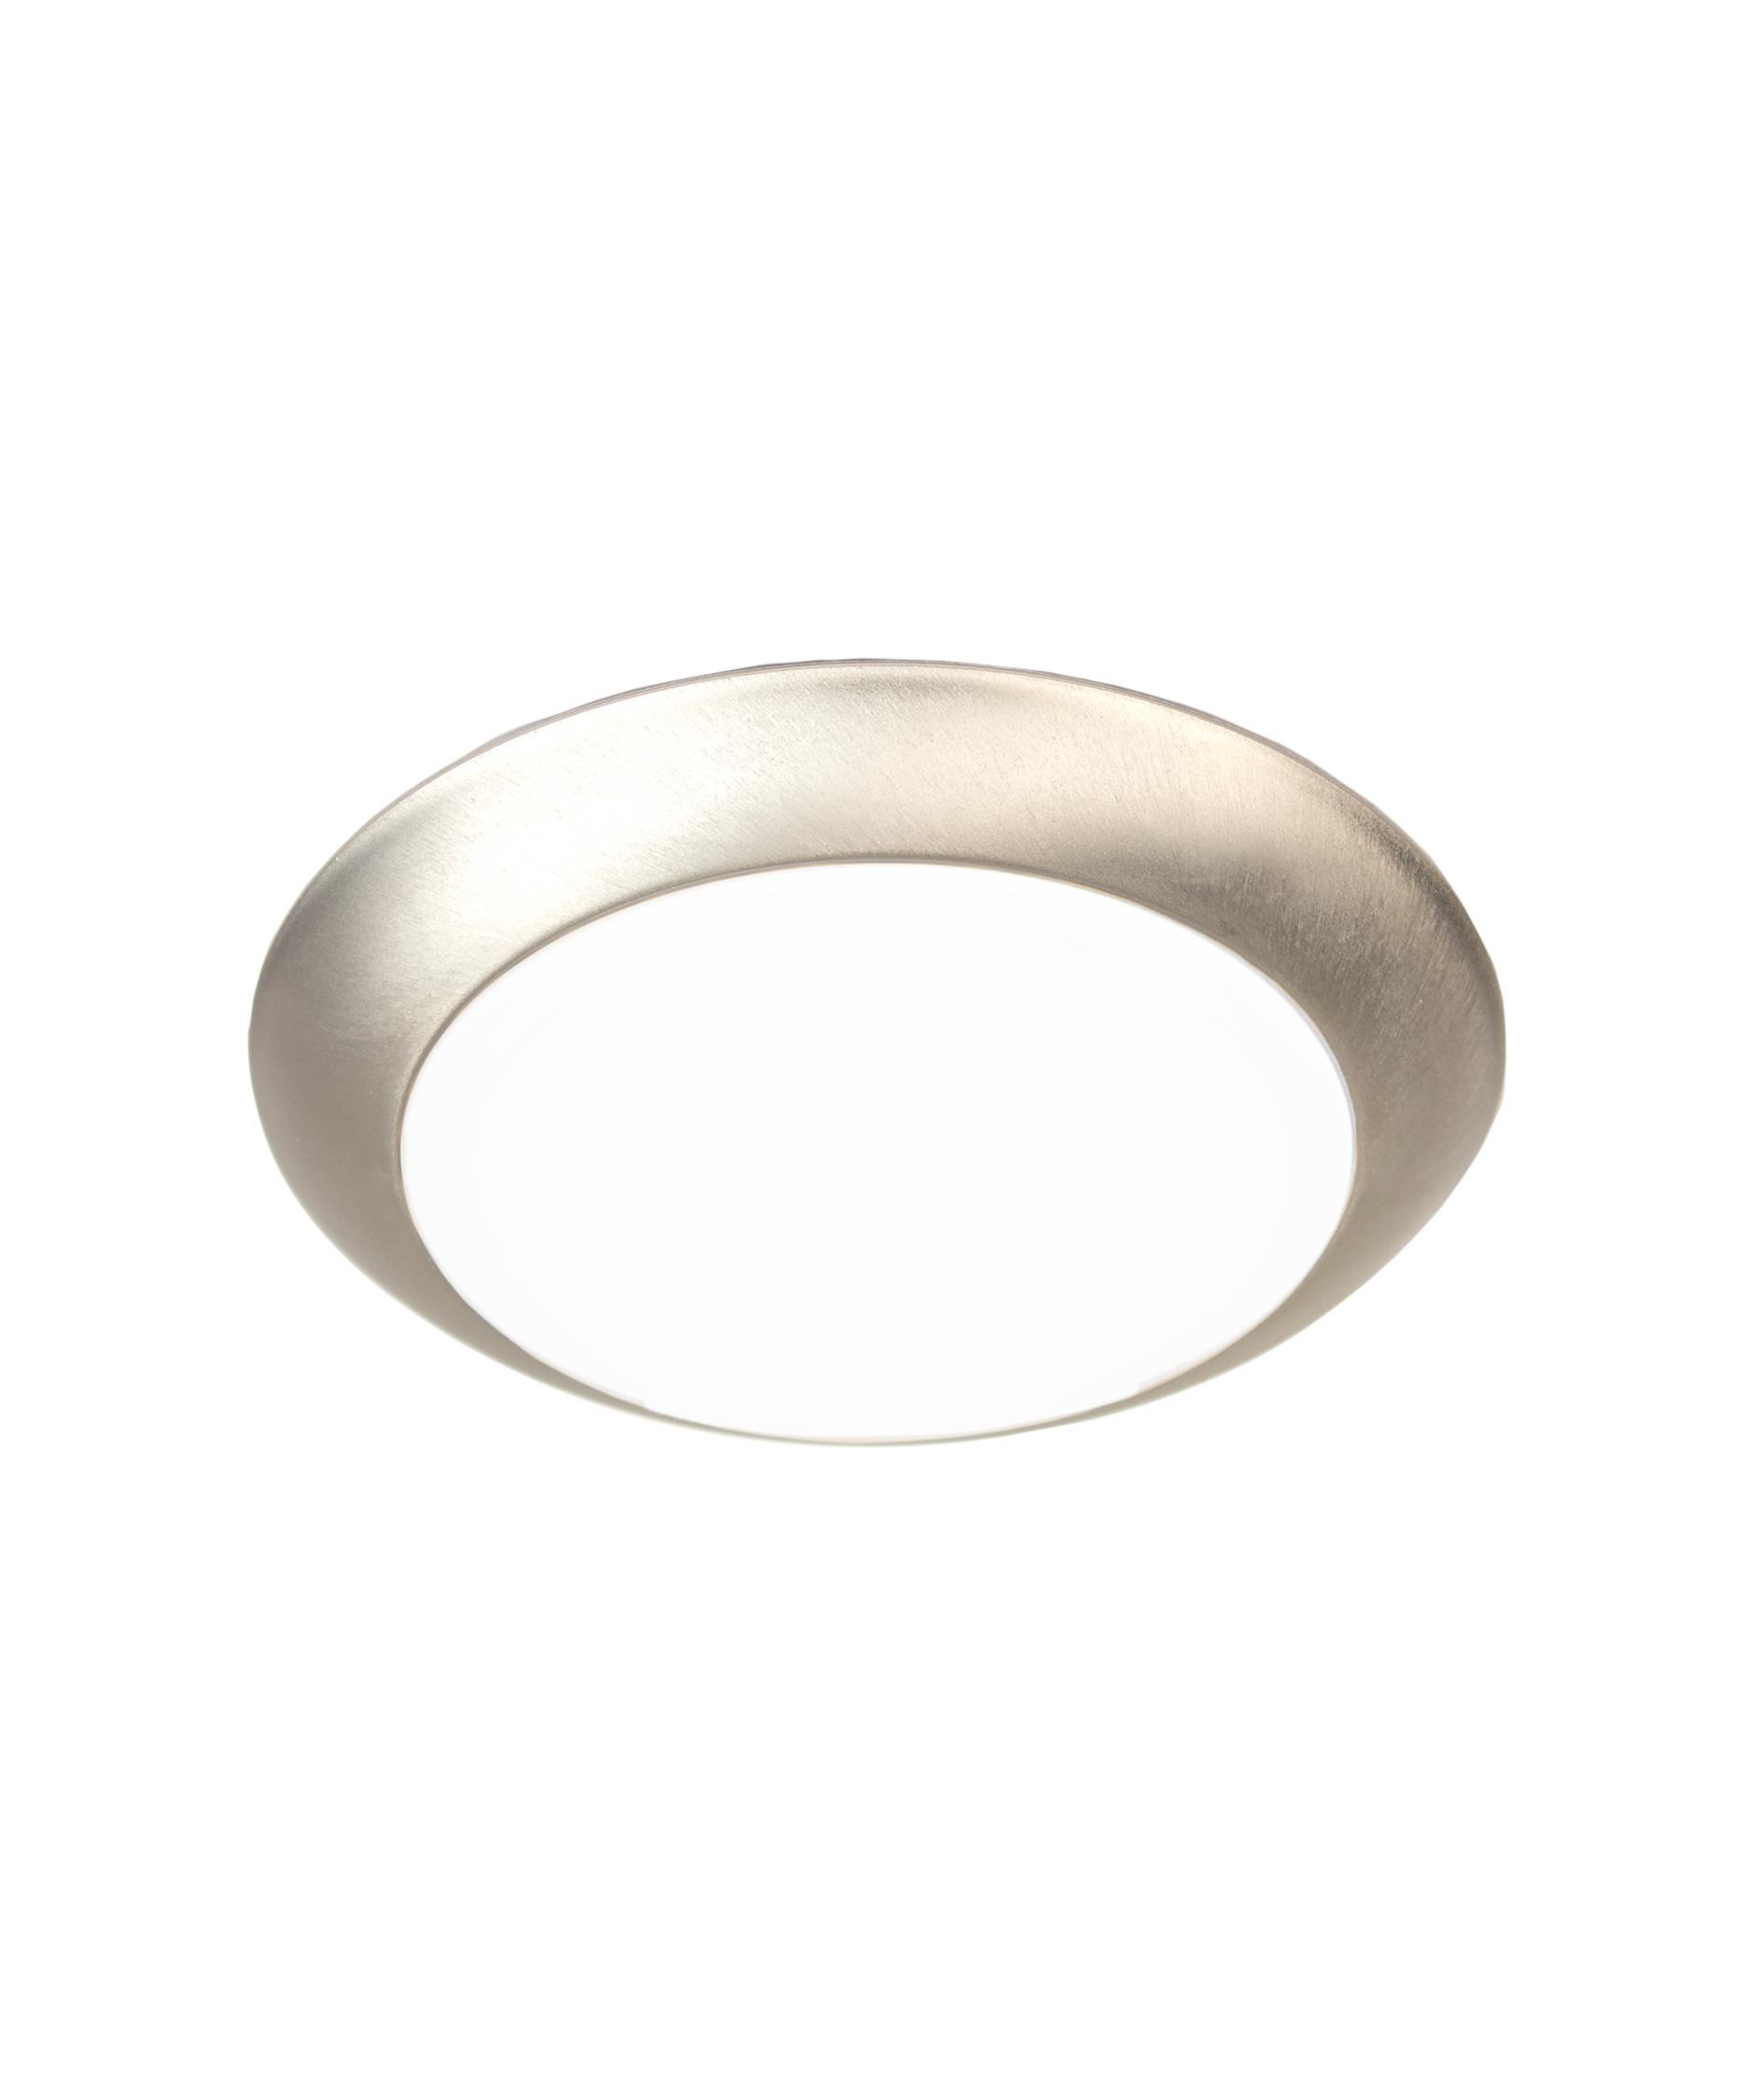 Wac lighting led - Wac Lighting Disc 7 Inch Wide Flush Mount Capitol Lighting 1 800lighting Com